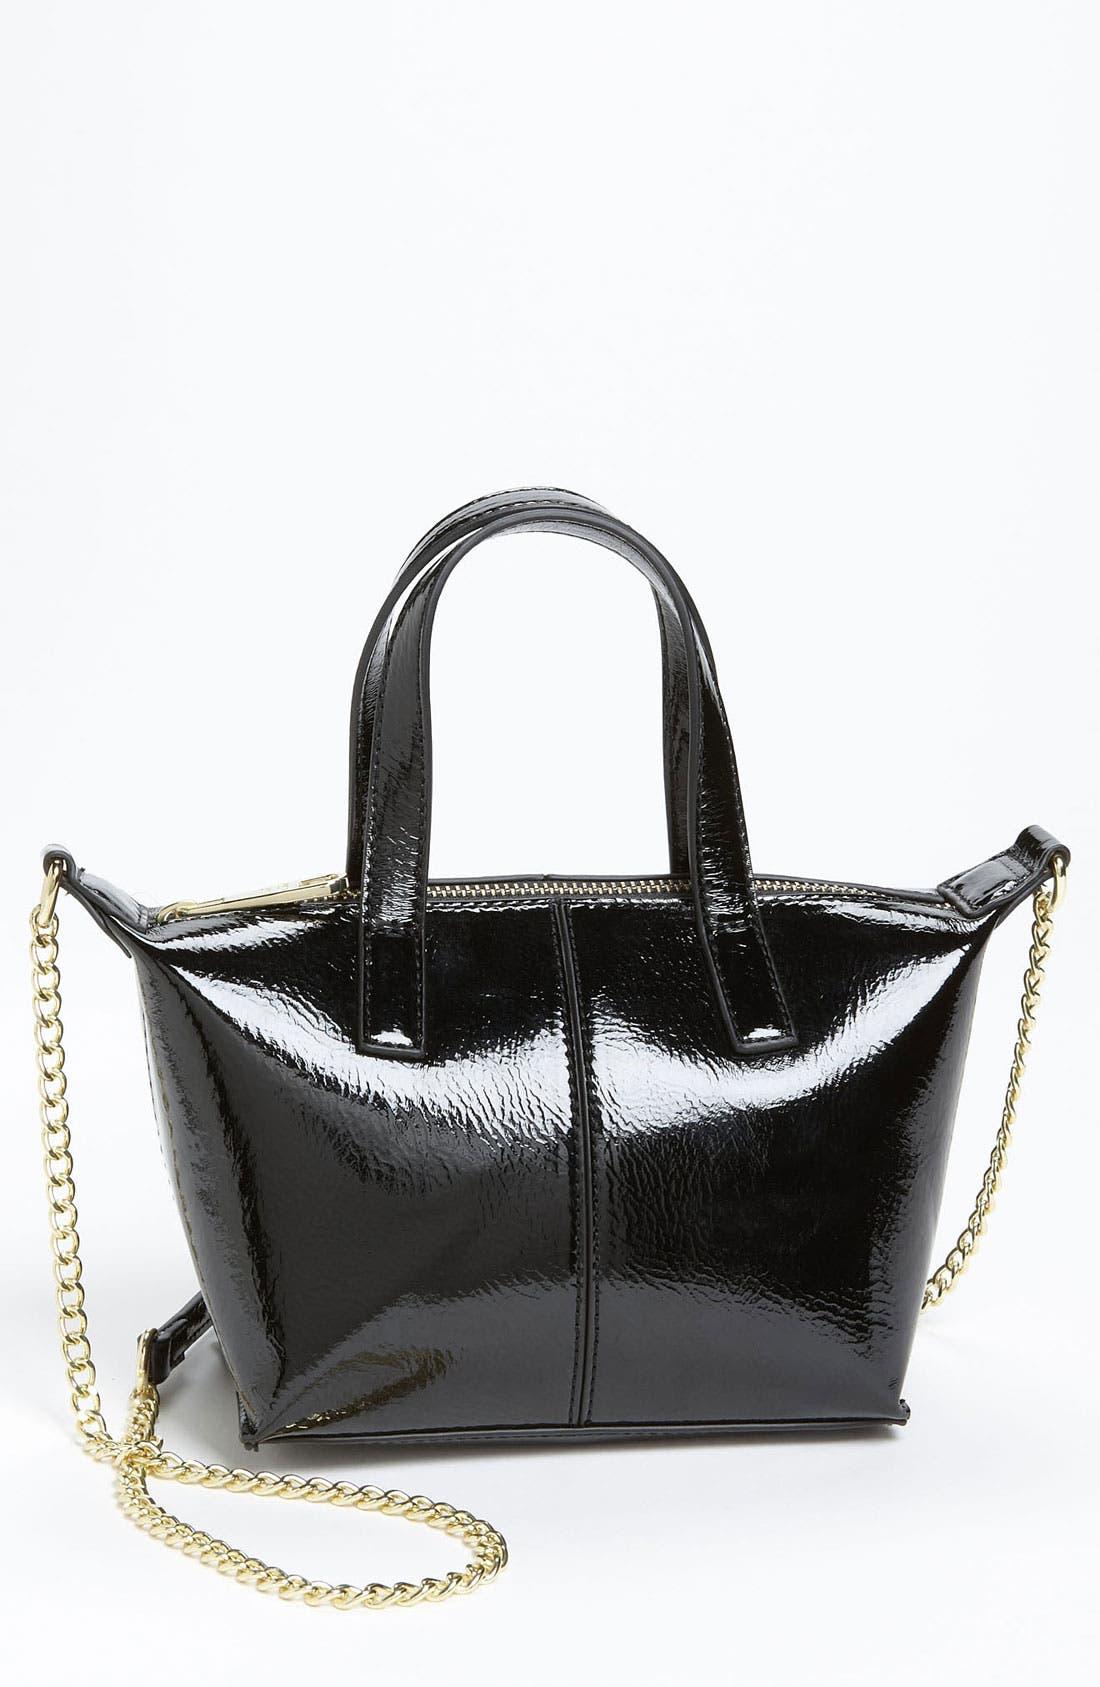 Main Image - Steve Madden 'Barris - Mini' Crossbody Bag